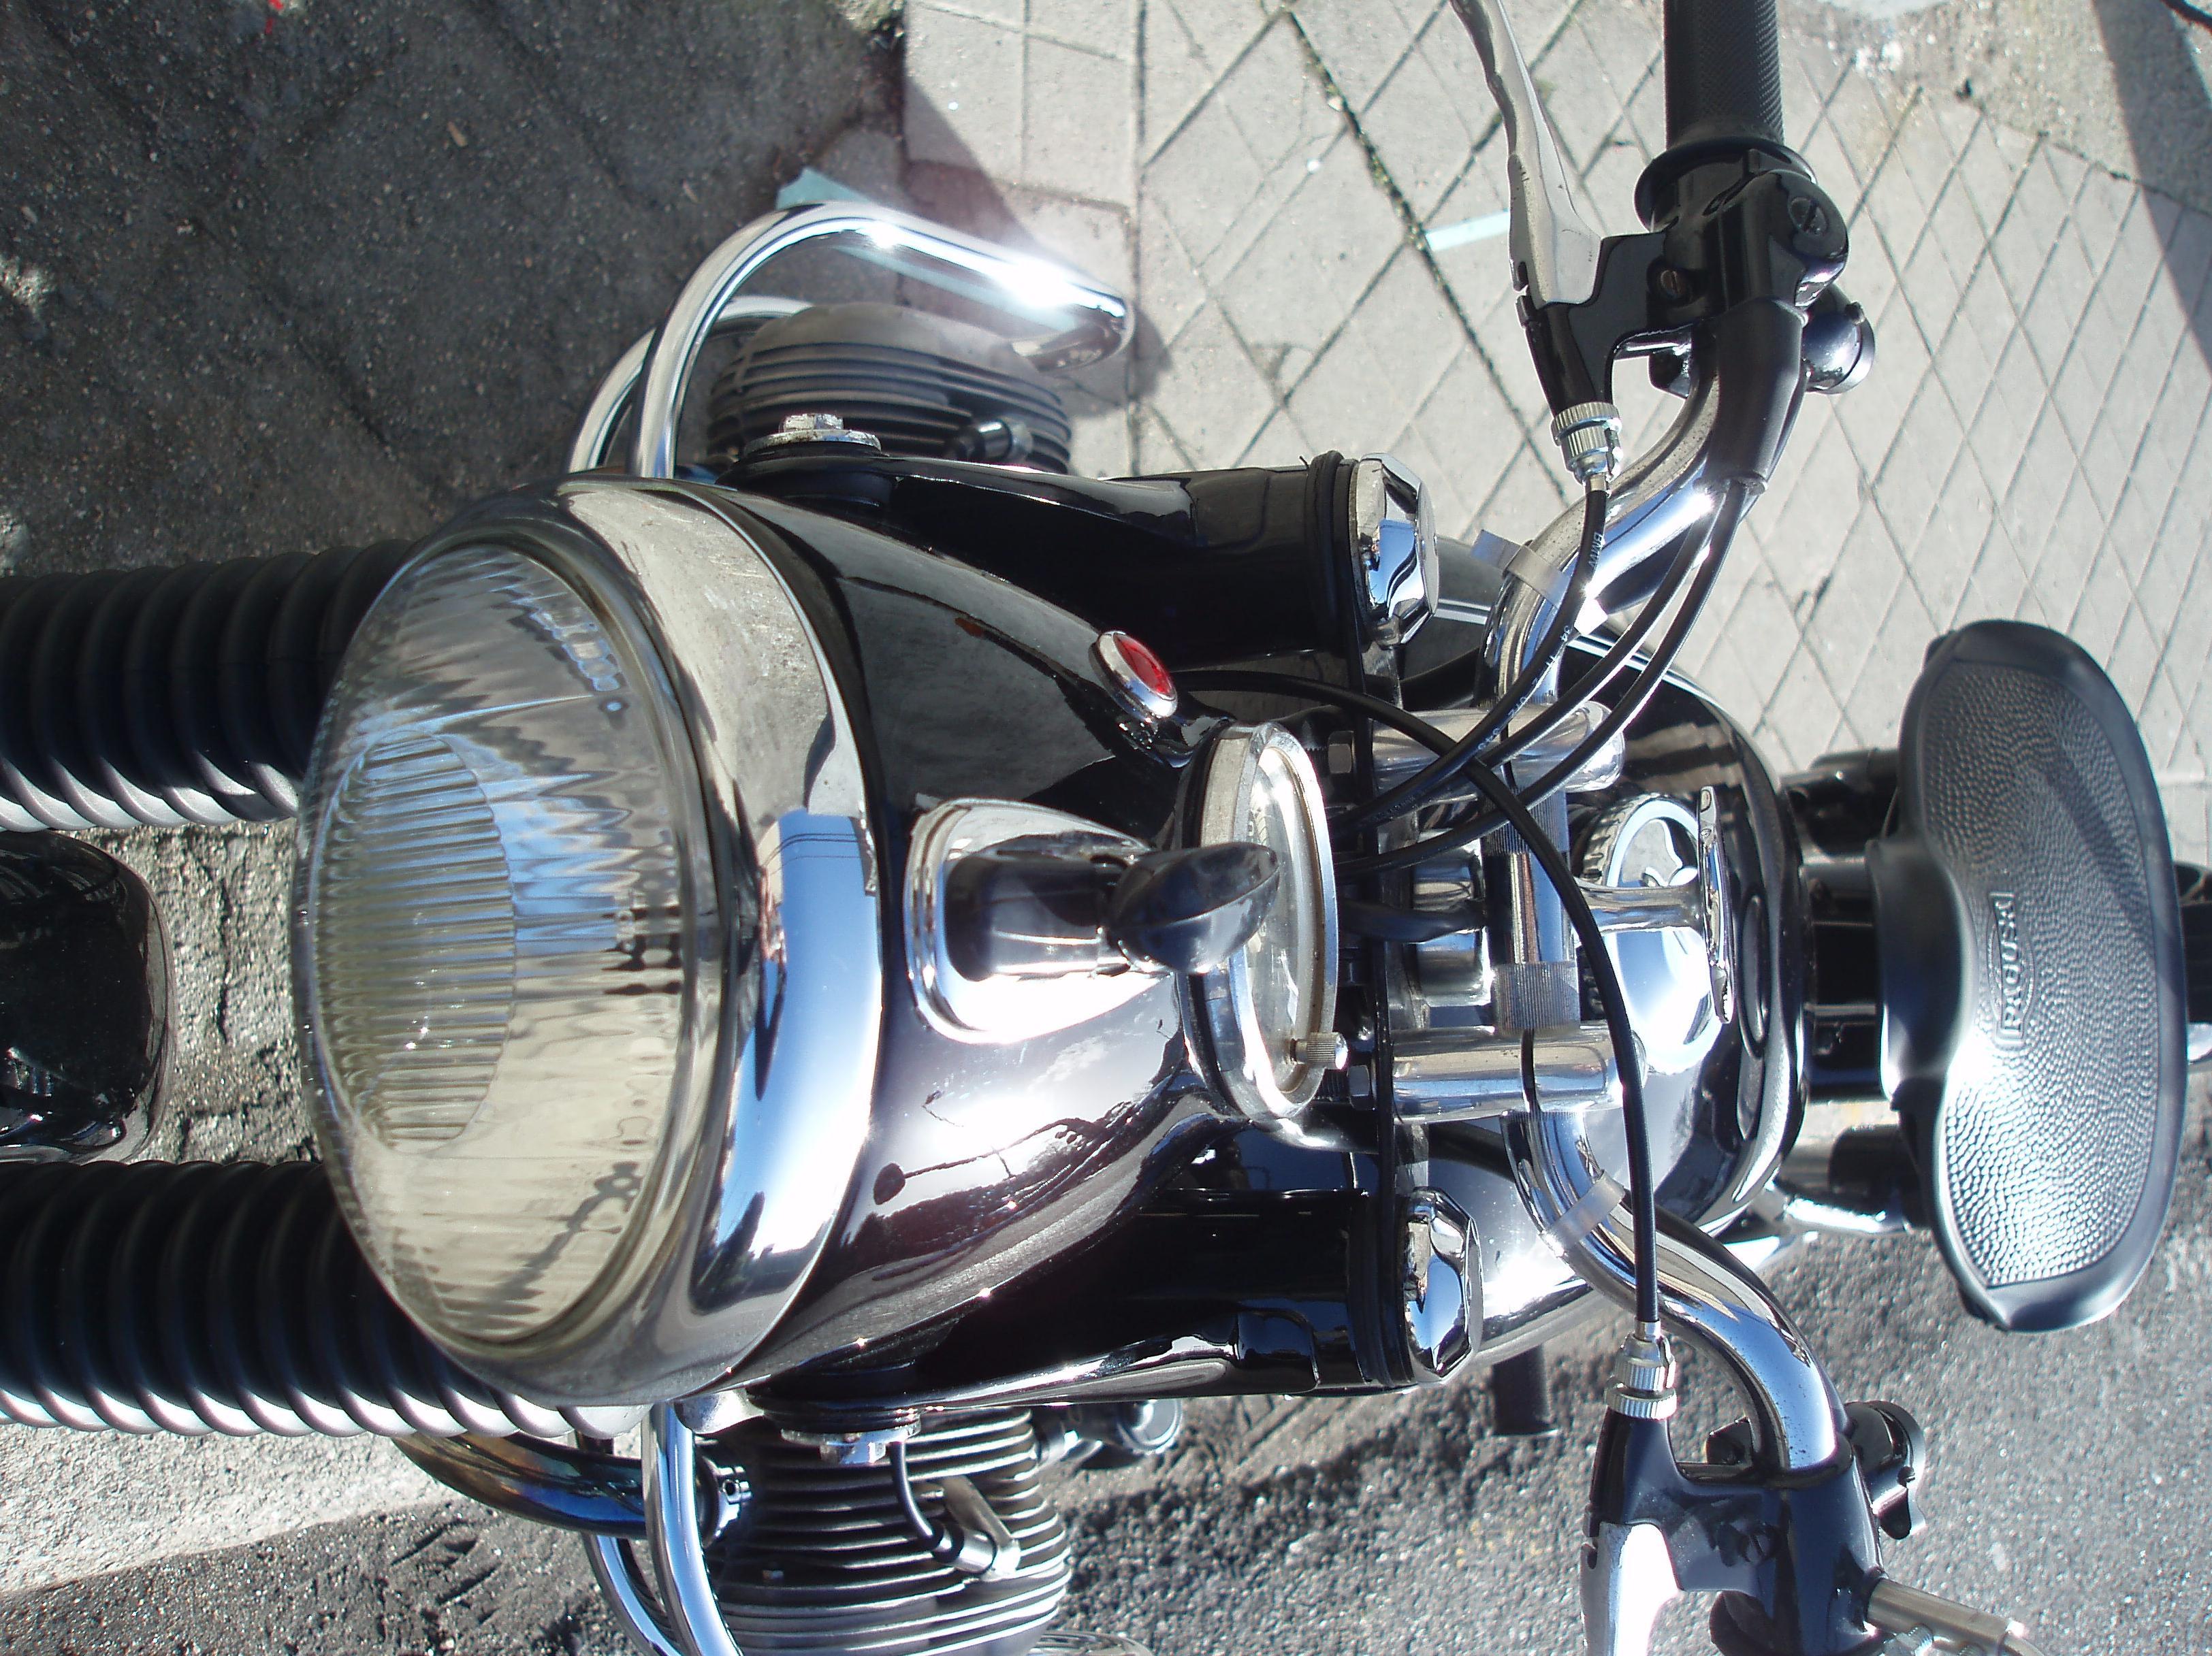 Foto 20 de Motos en Vigo | Moto 2